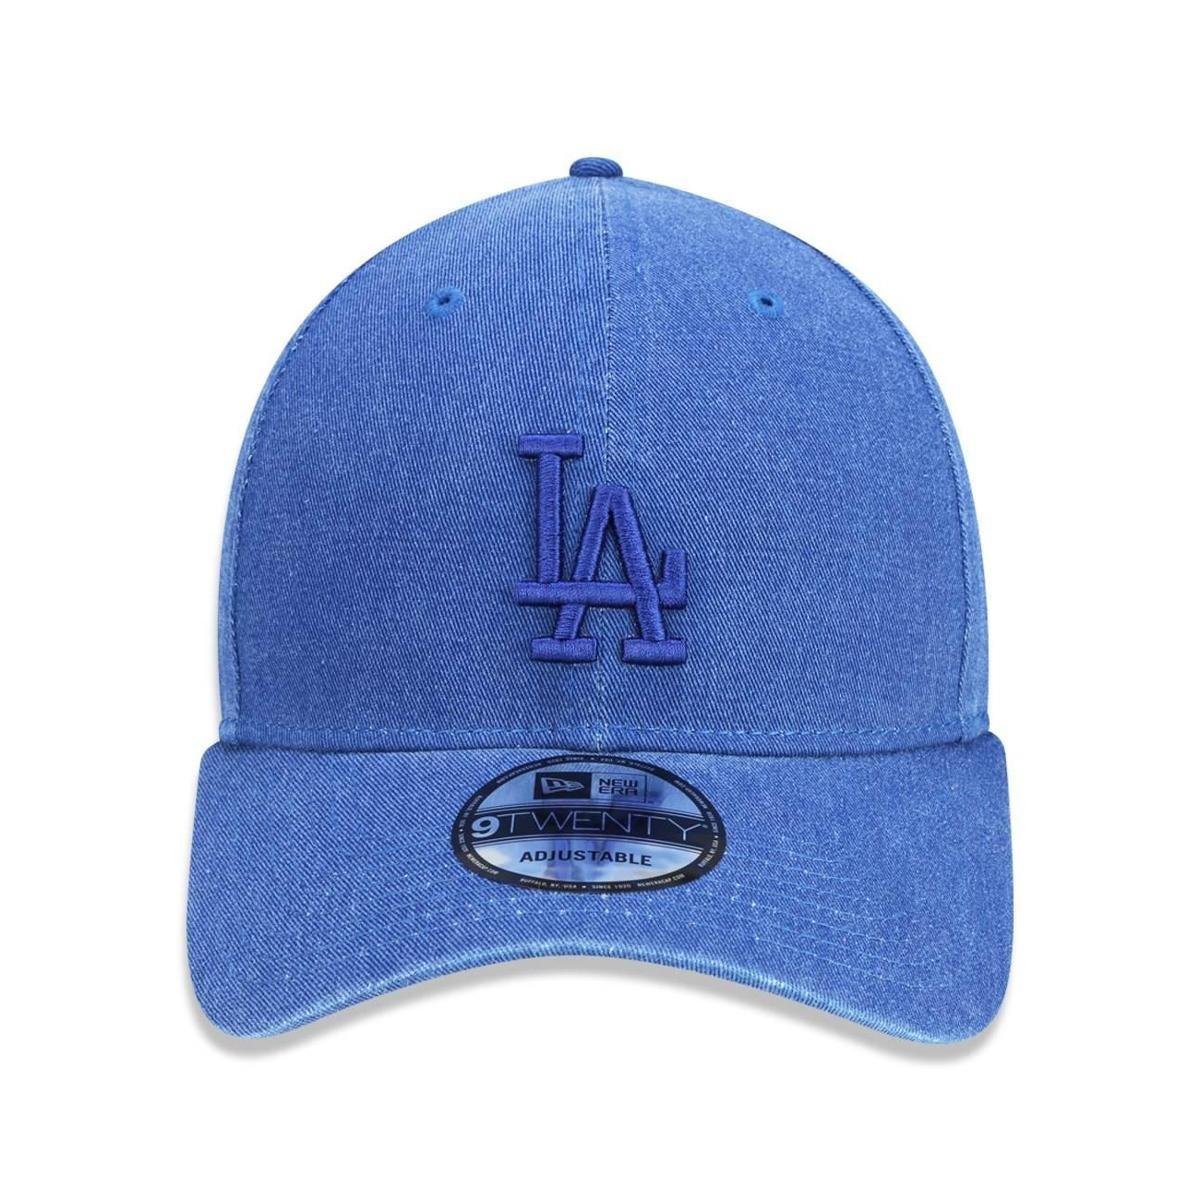 Bone 920 Los Angeles Dodgers MLB New Era - Azul - Compre Agora  32847cf9dbb